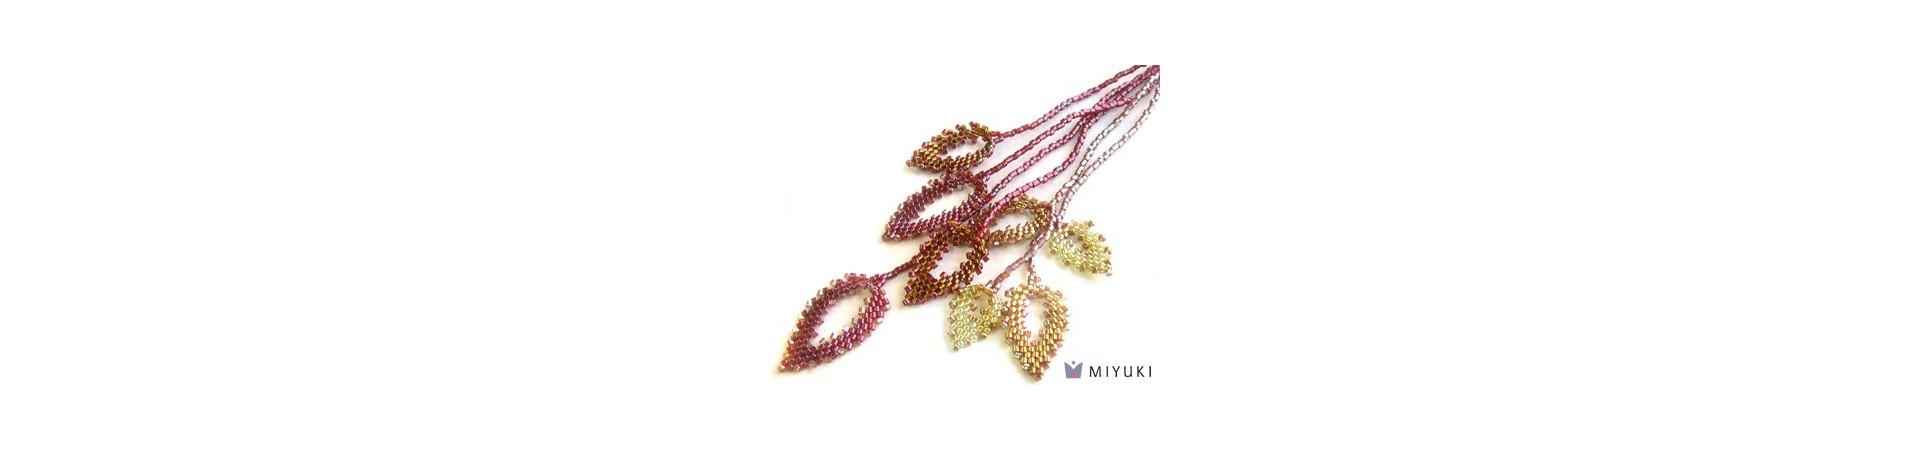 Miyuki Ümmargused Rocailles 11/0 (2.0mm)